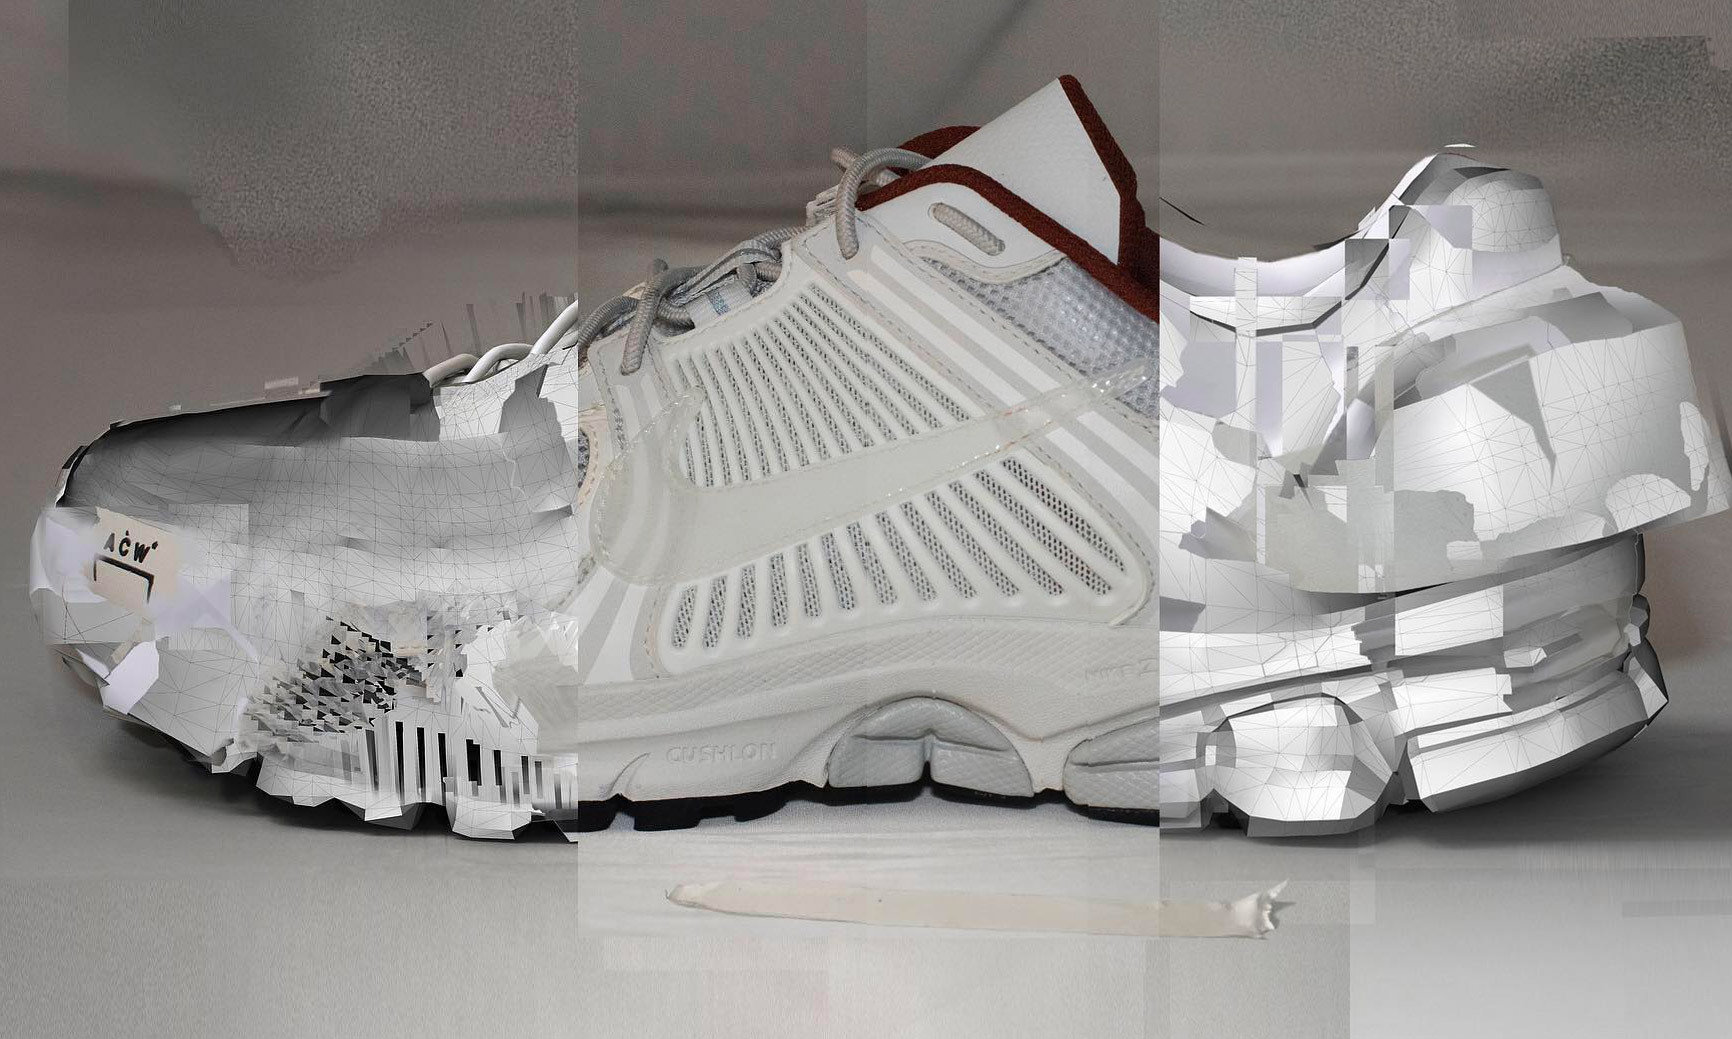 best sneakers a08a0 afb5b A-COLD-WALL x Nike Air Force 1 还没发售,新跑鞋就出来了?报道